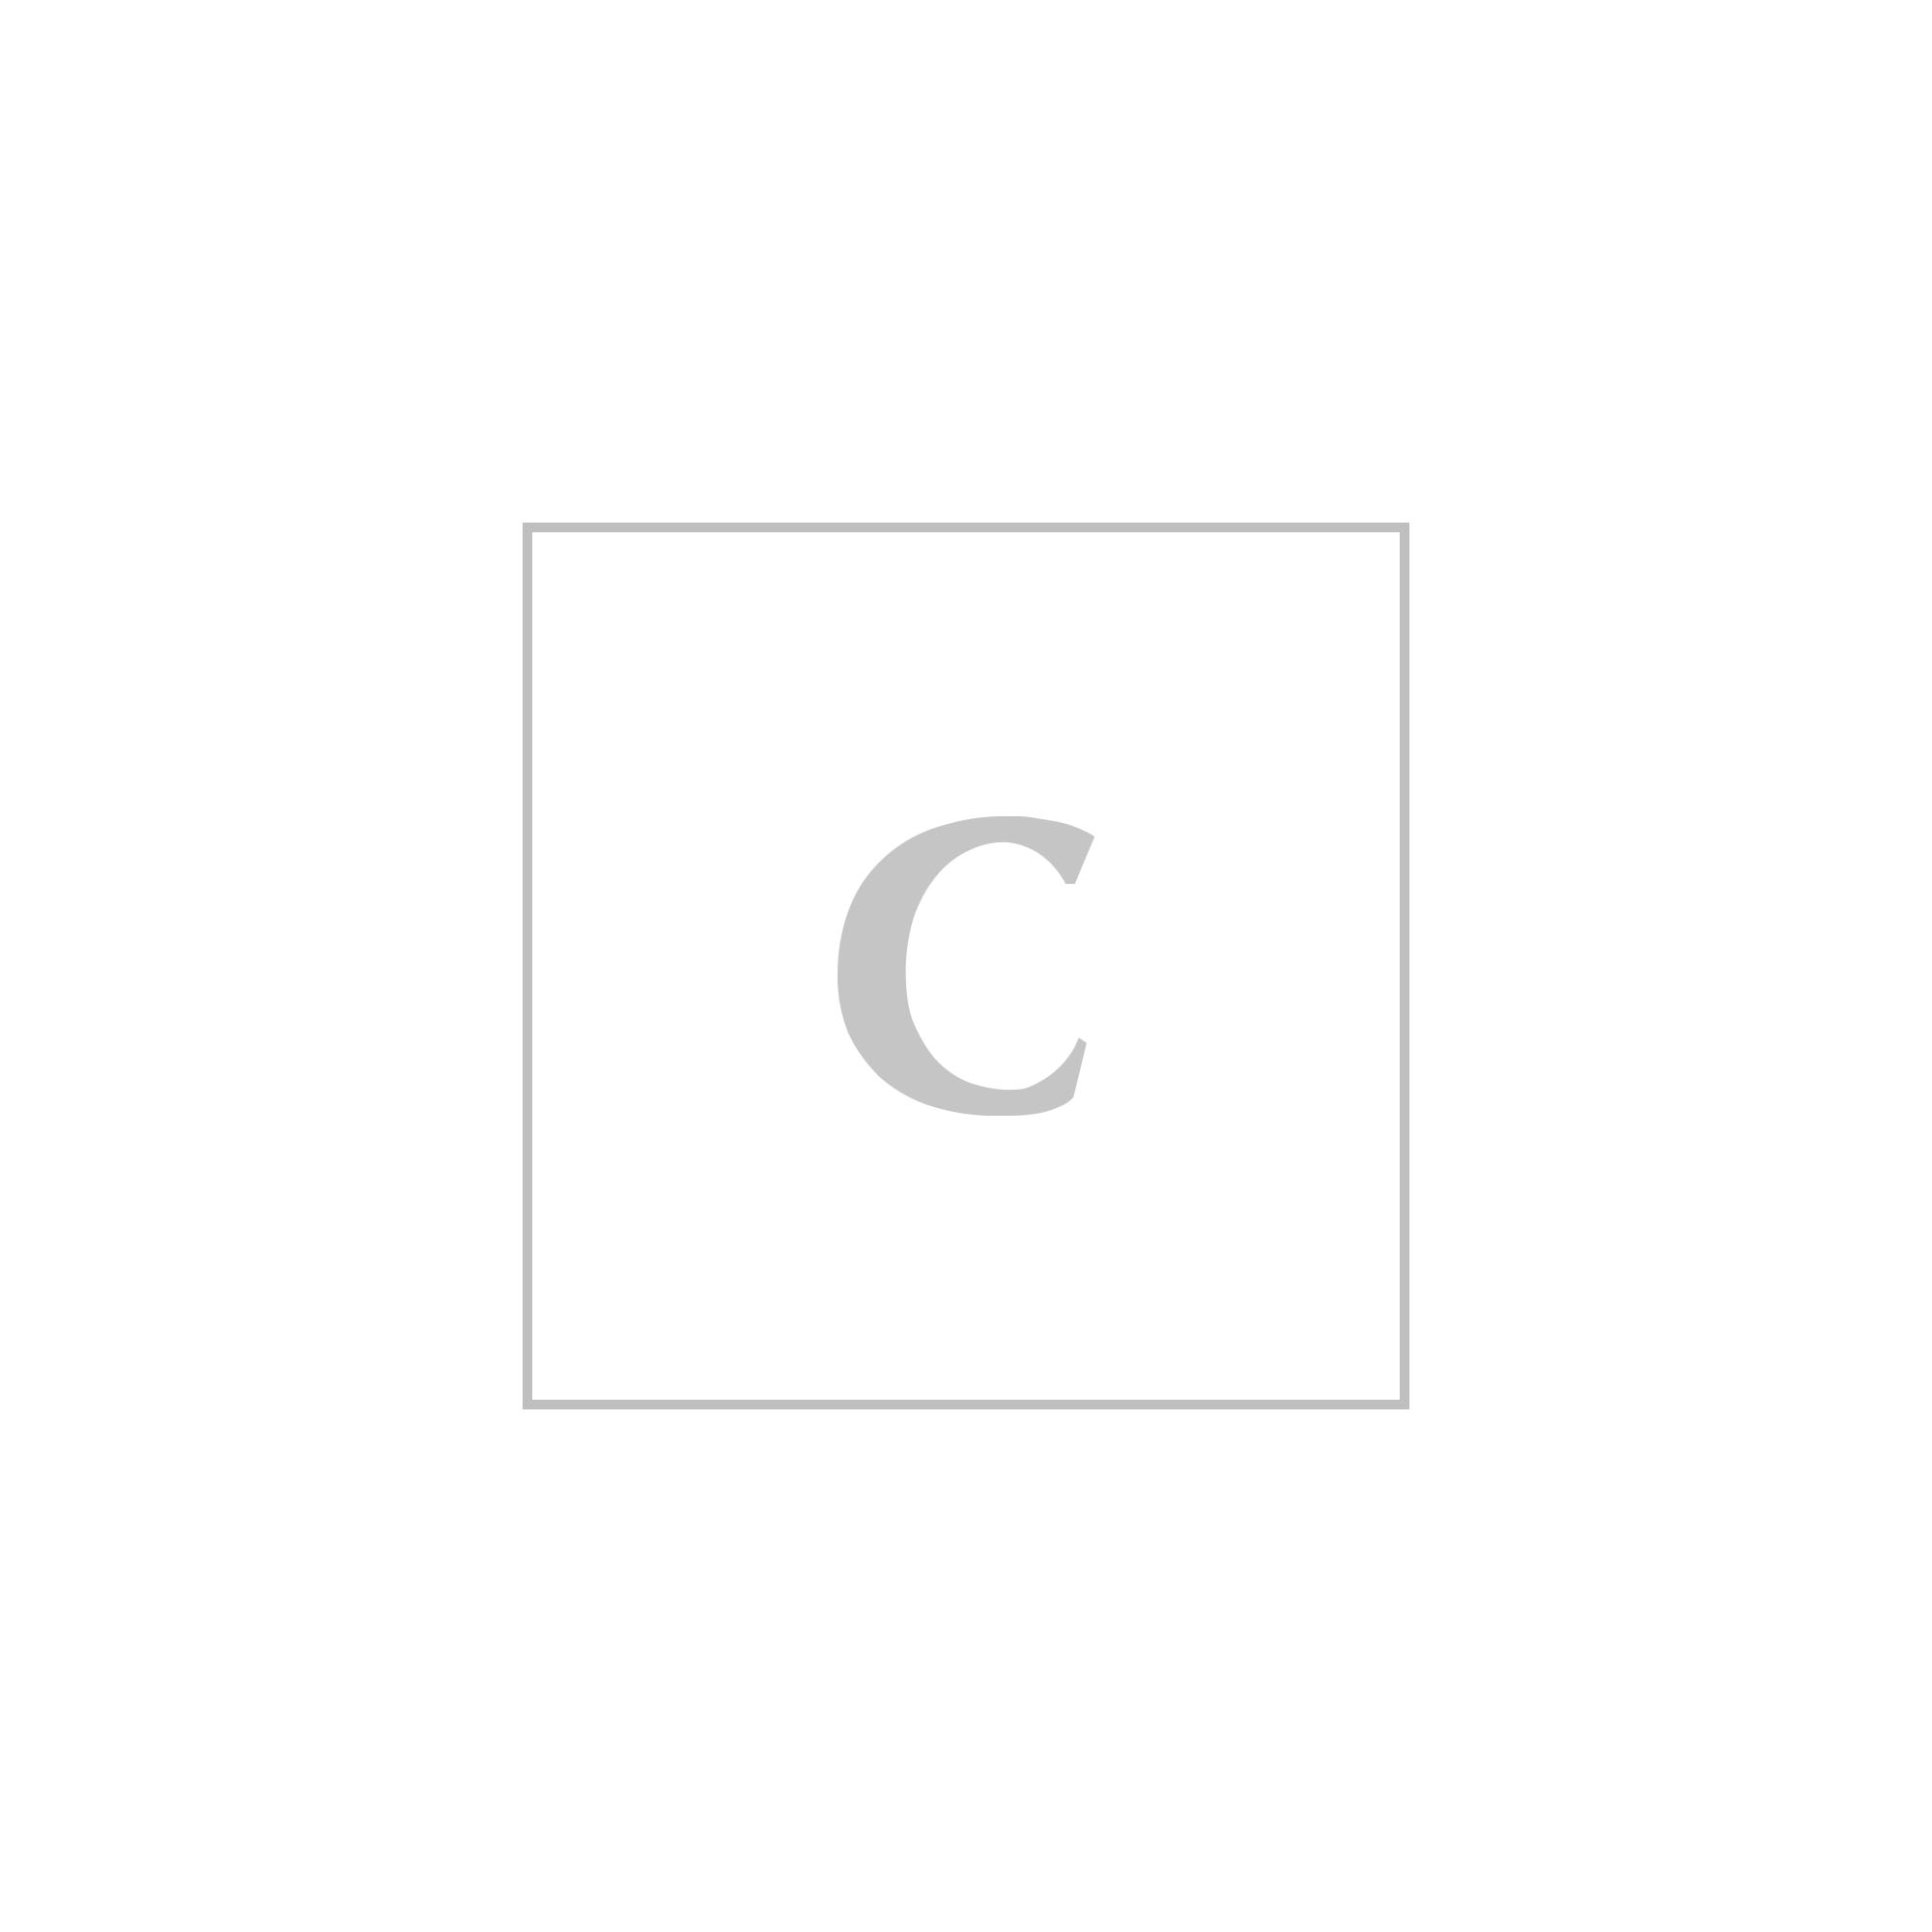 Saint laurent monogram clutch with chain